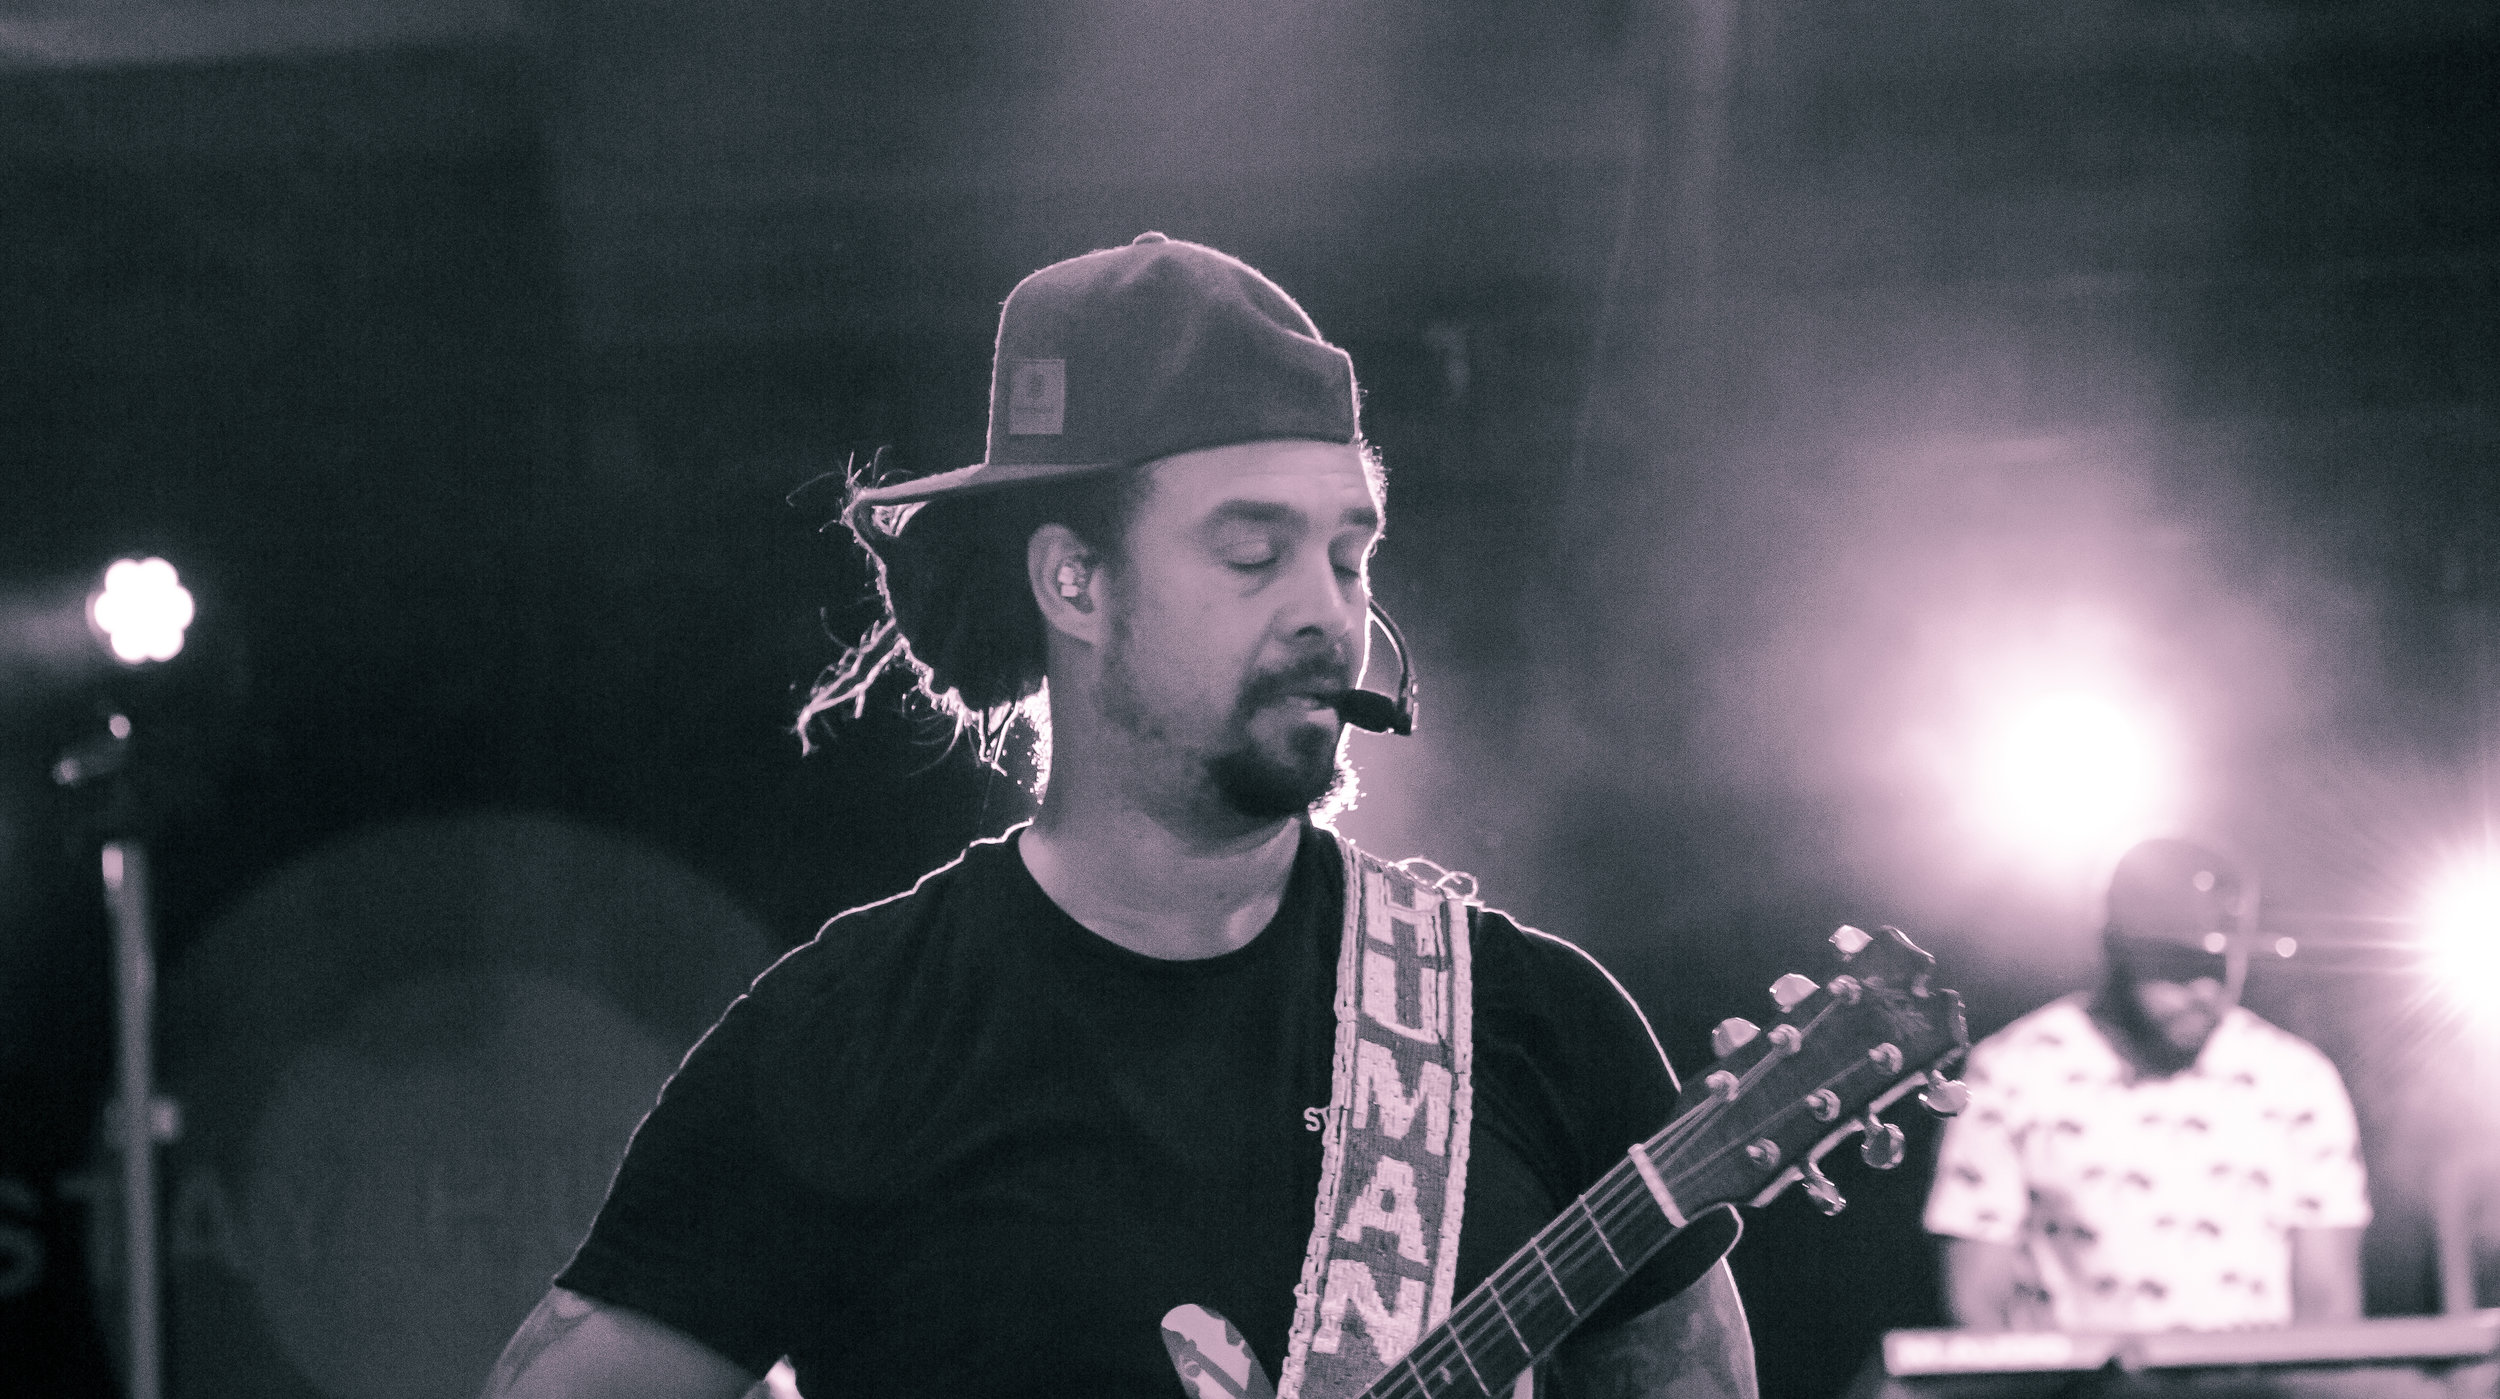 Michael Franti performs at Britt Festival, 2018, Jacksonville, Oregon.